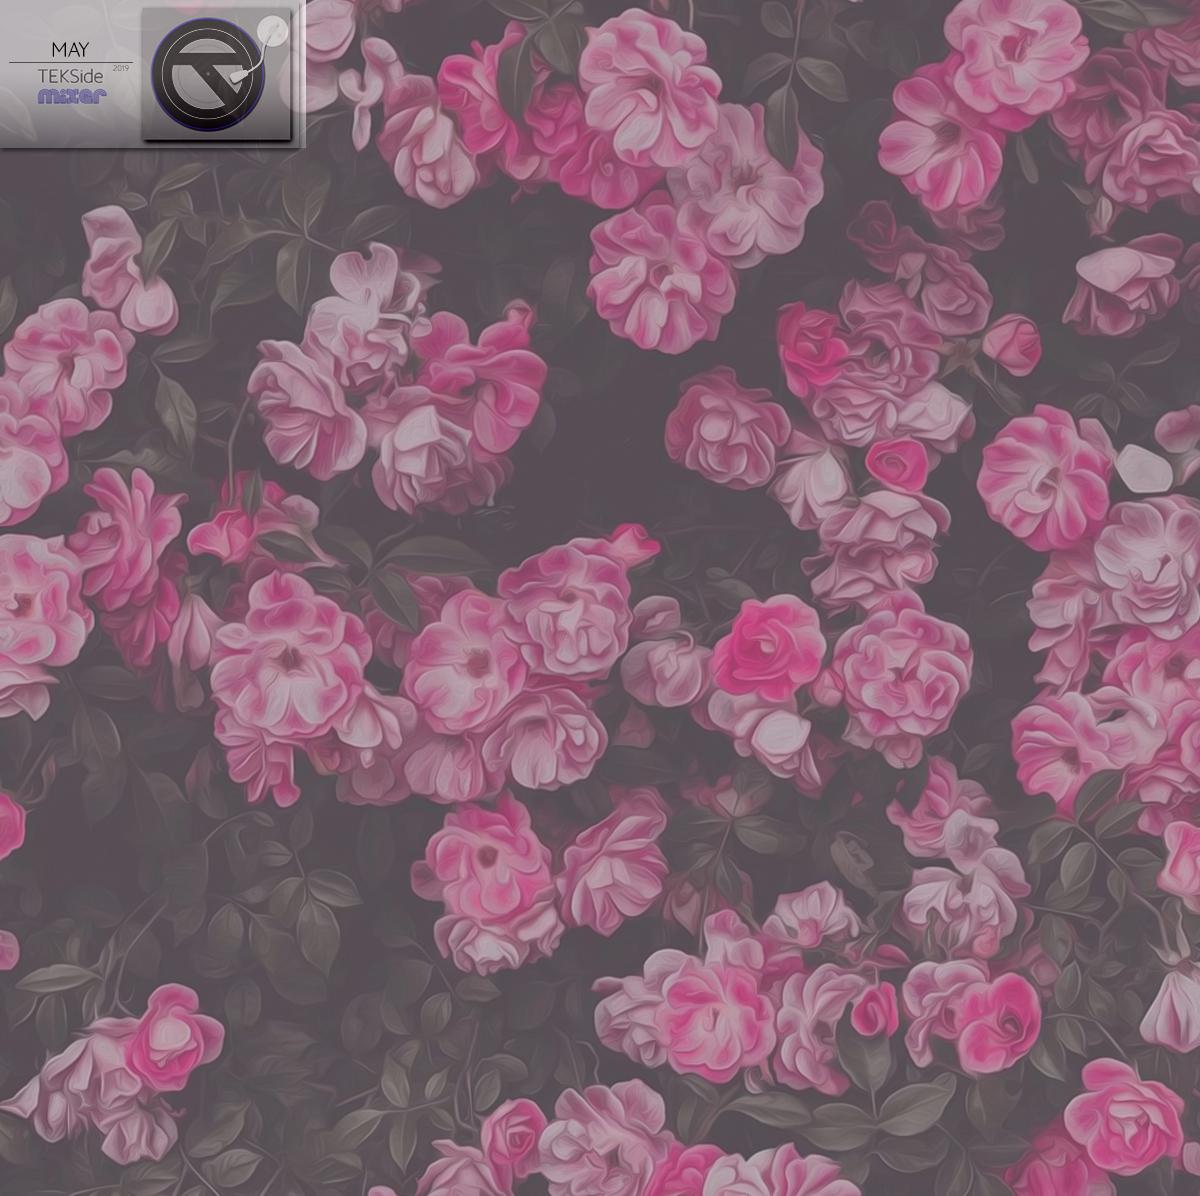 AlbumCoversMay18.jpg